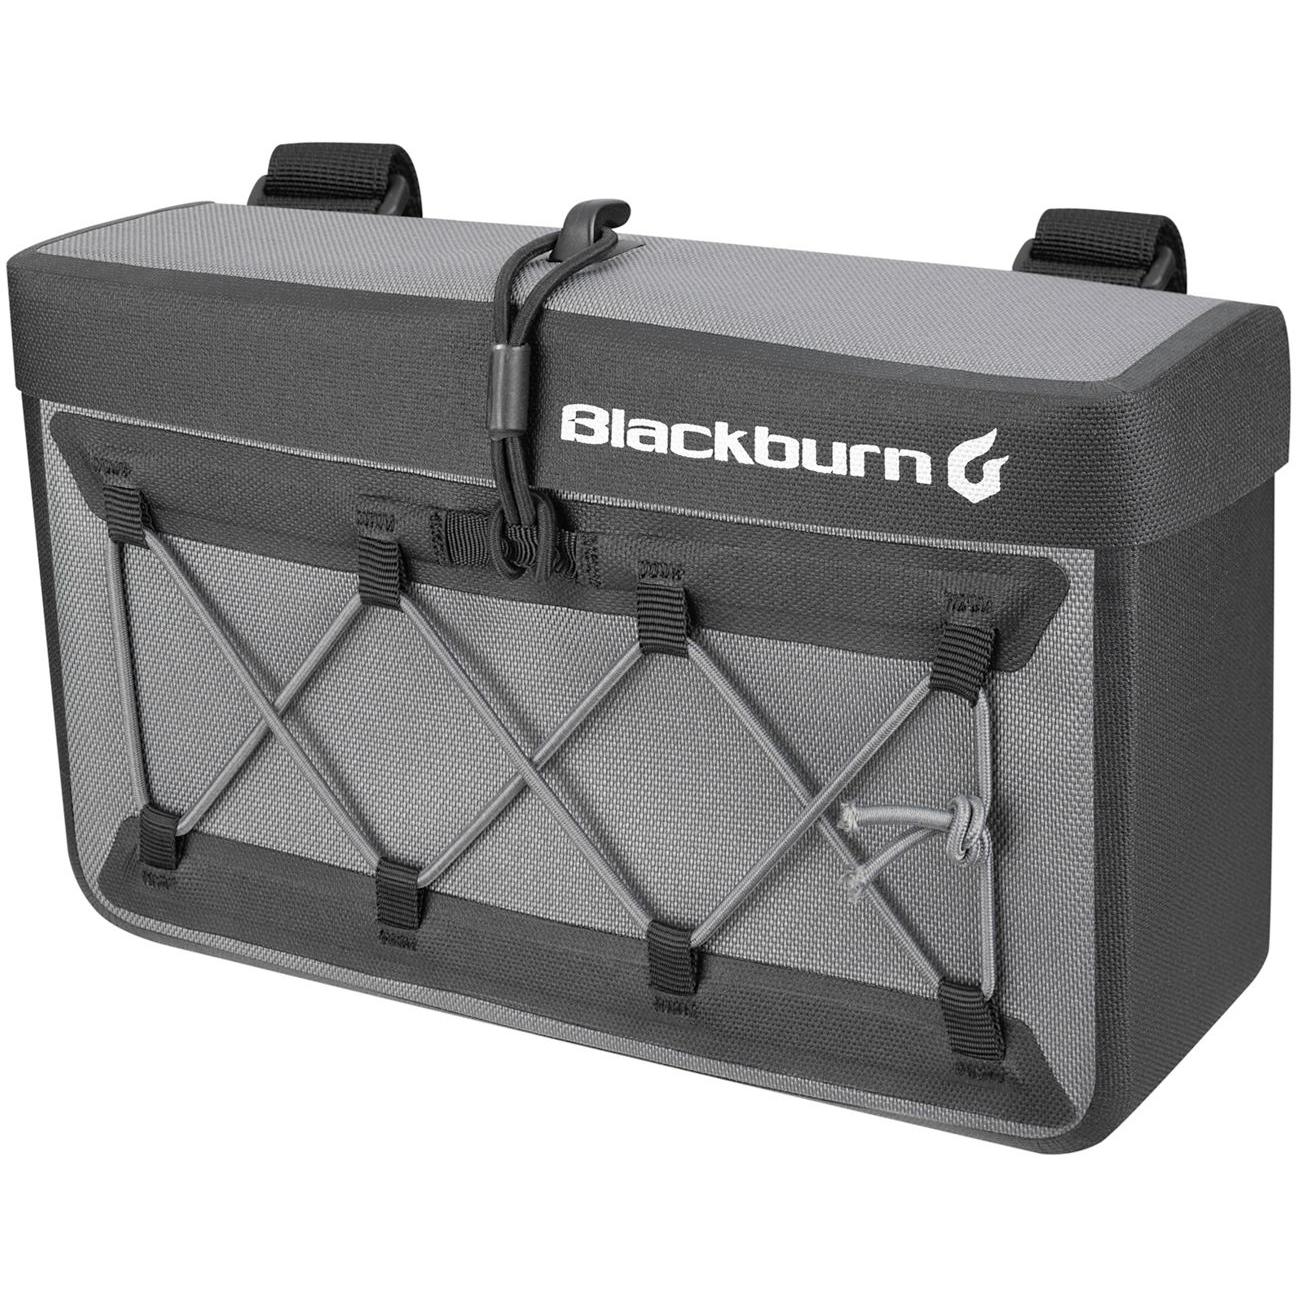 Blackburn Outpost Elite Hitchhiker HB Bag